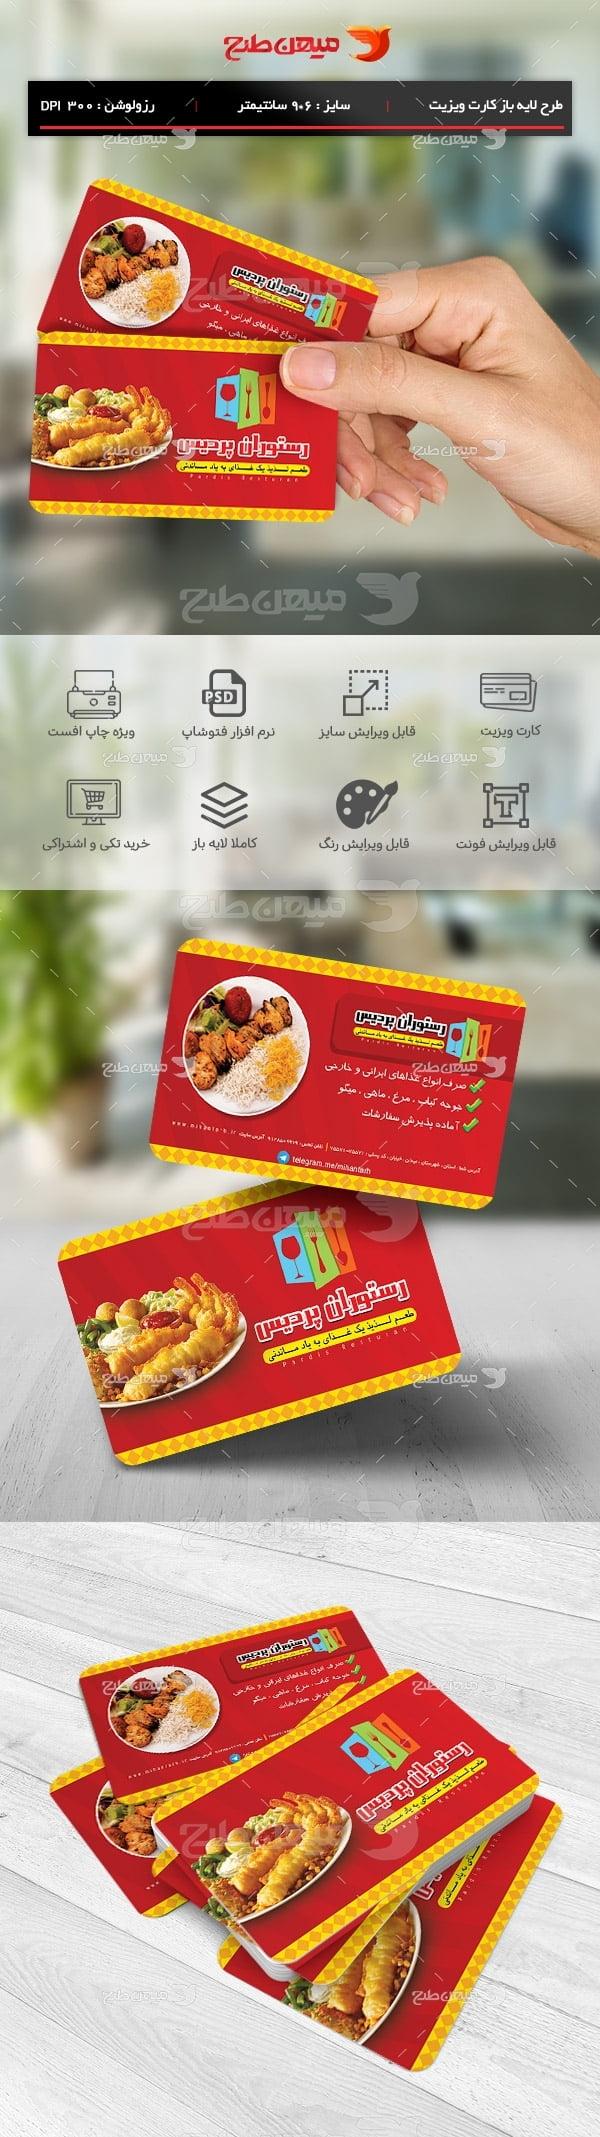 طرح کارت ویزیت لایه باز رستوران پردیس